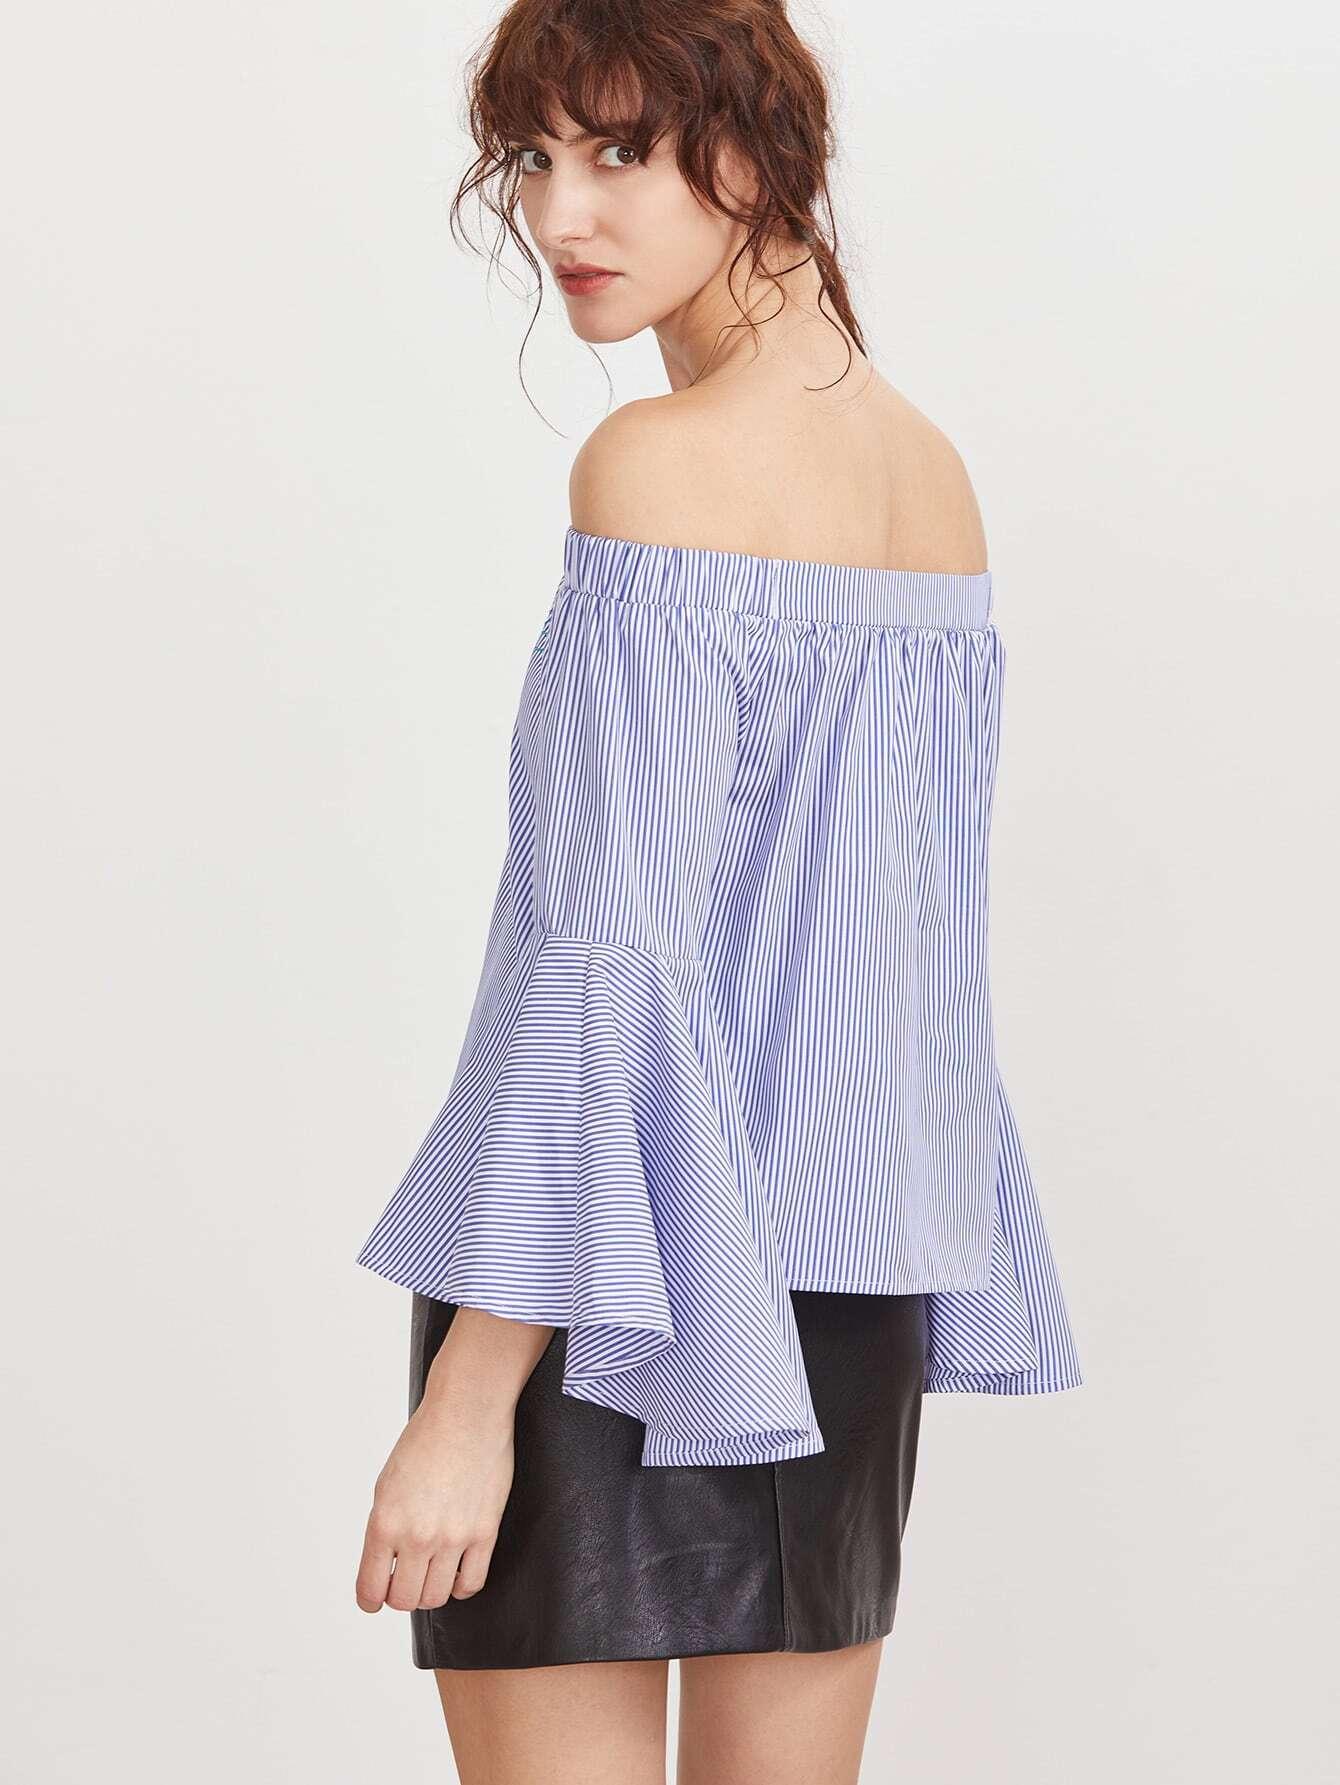 blouse161226706_2